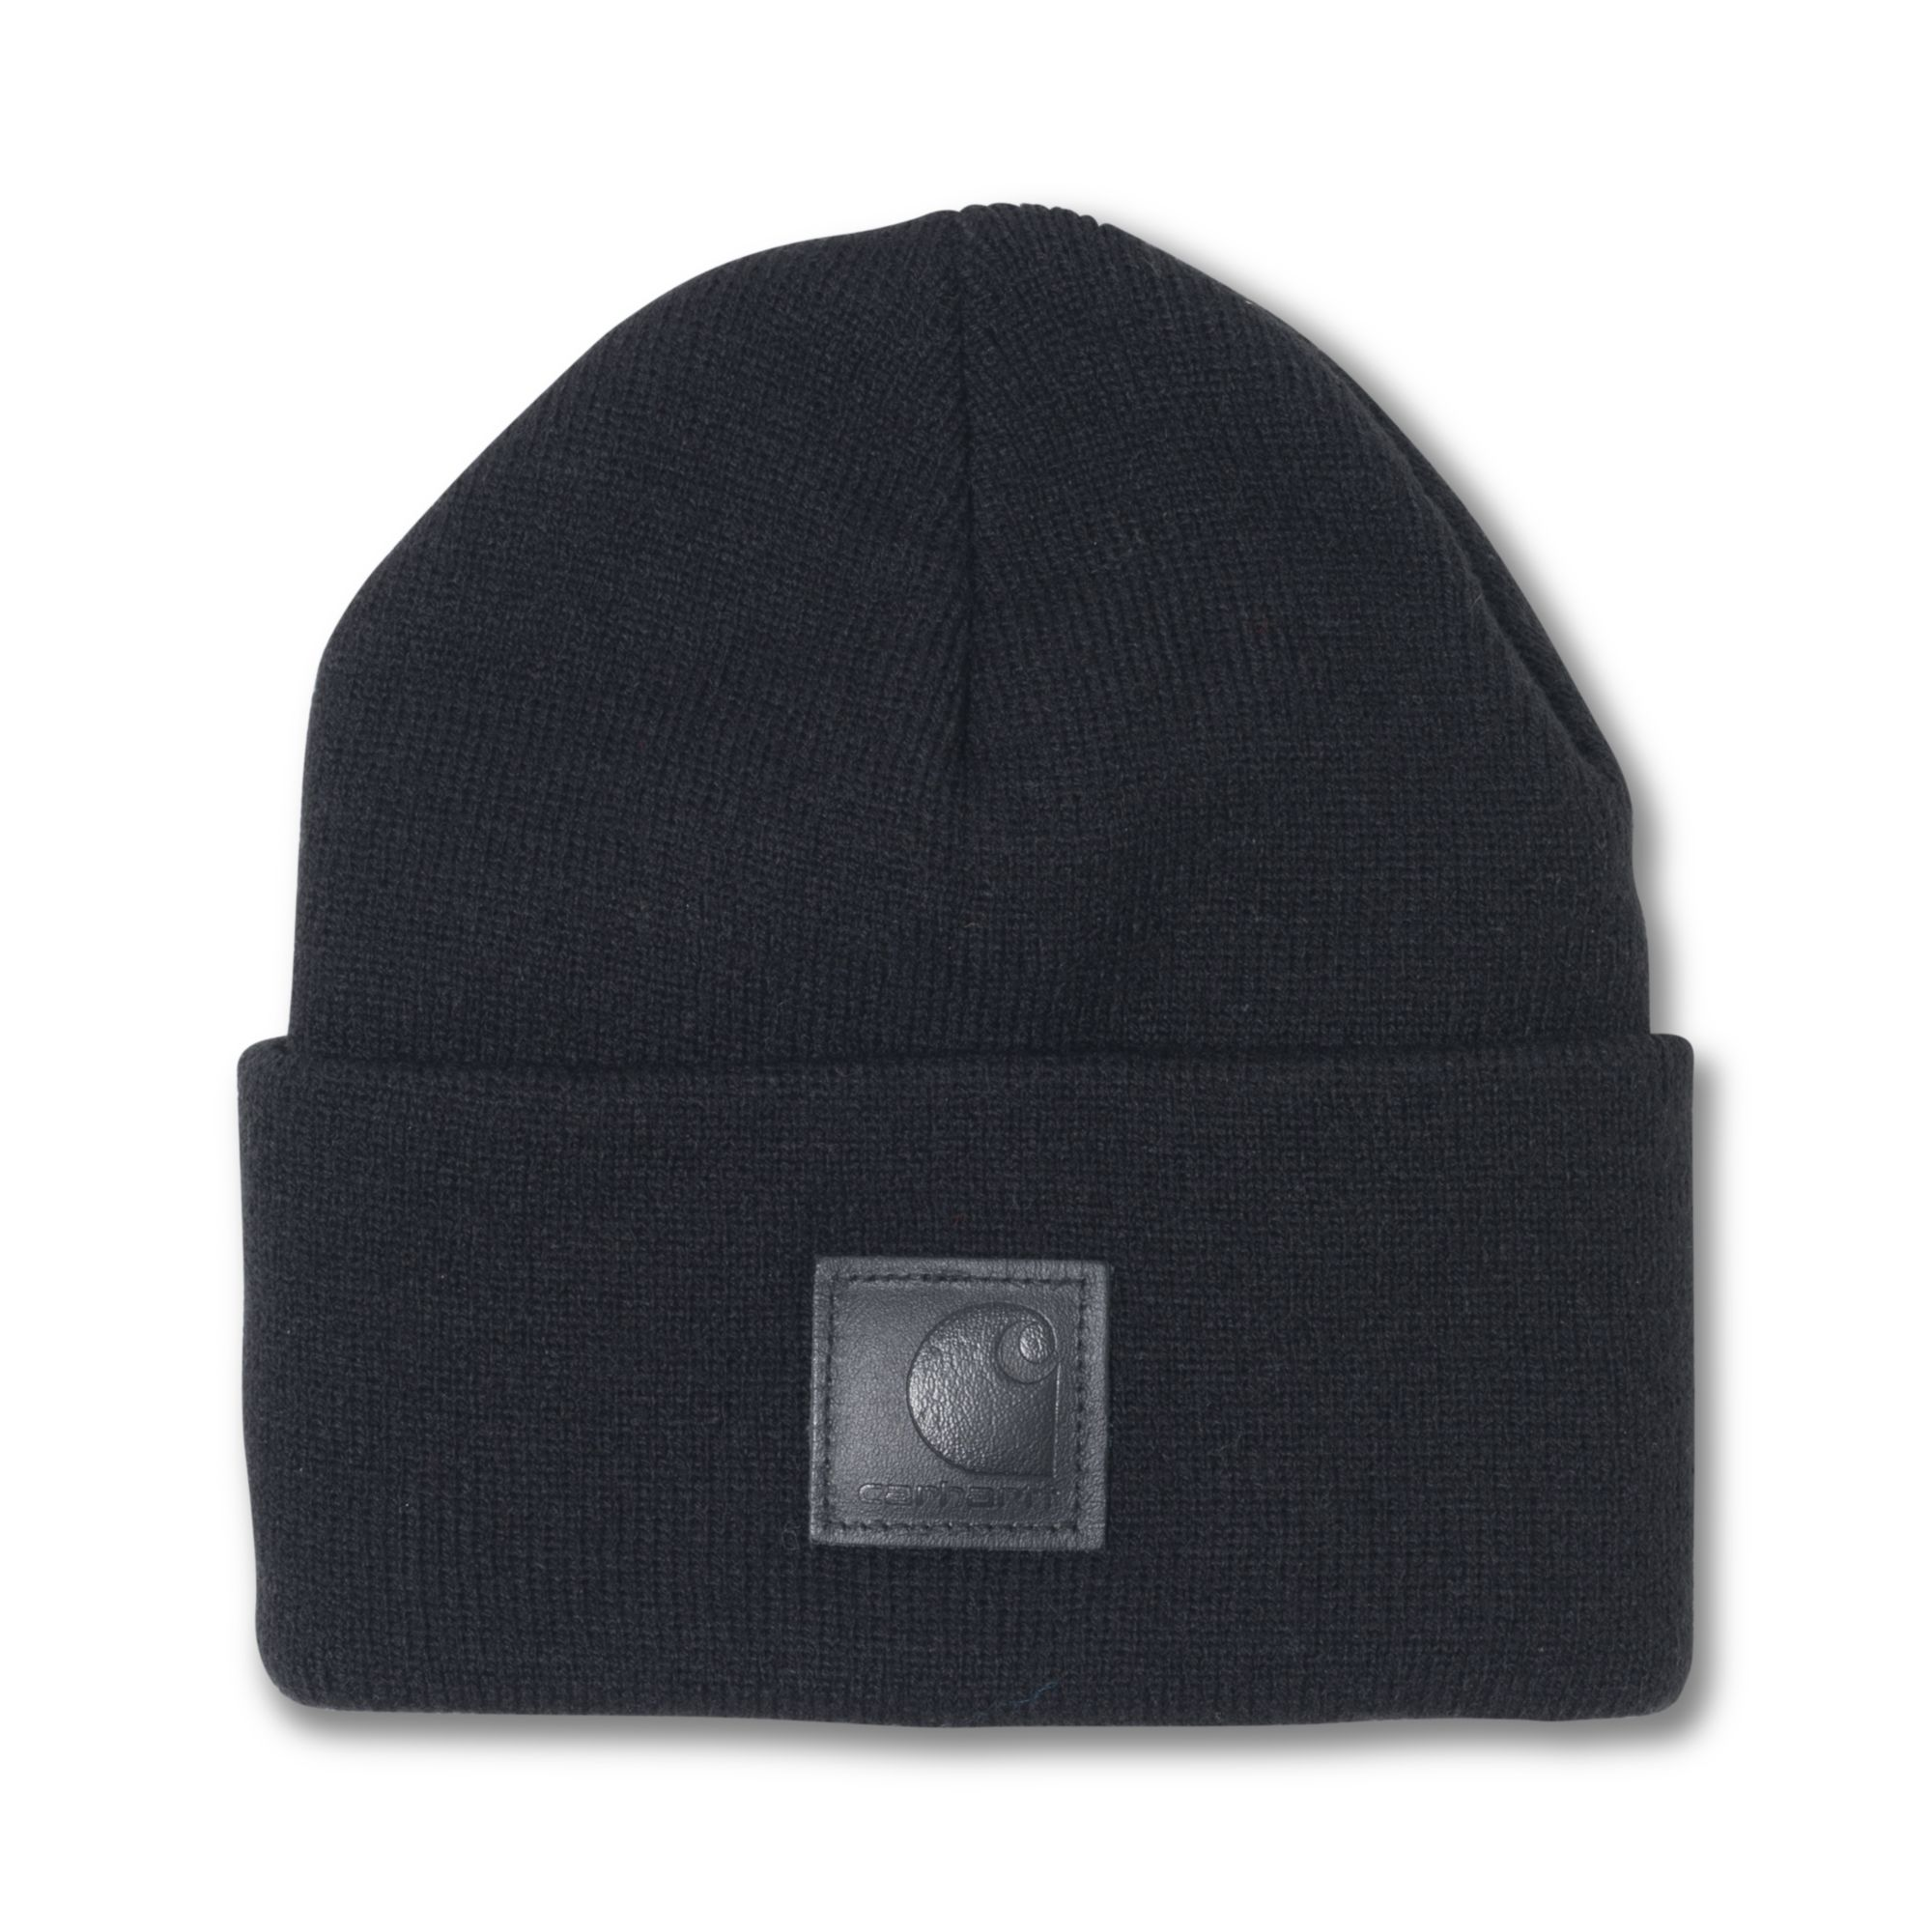 Lyst Carhartt Skull Cap In Black For Men